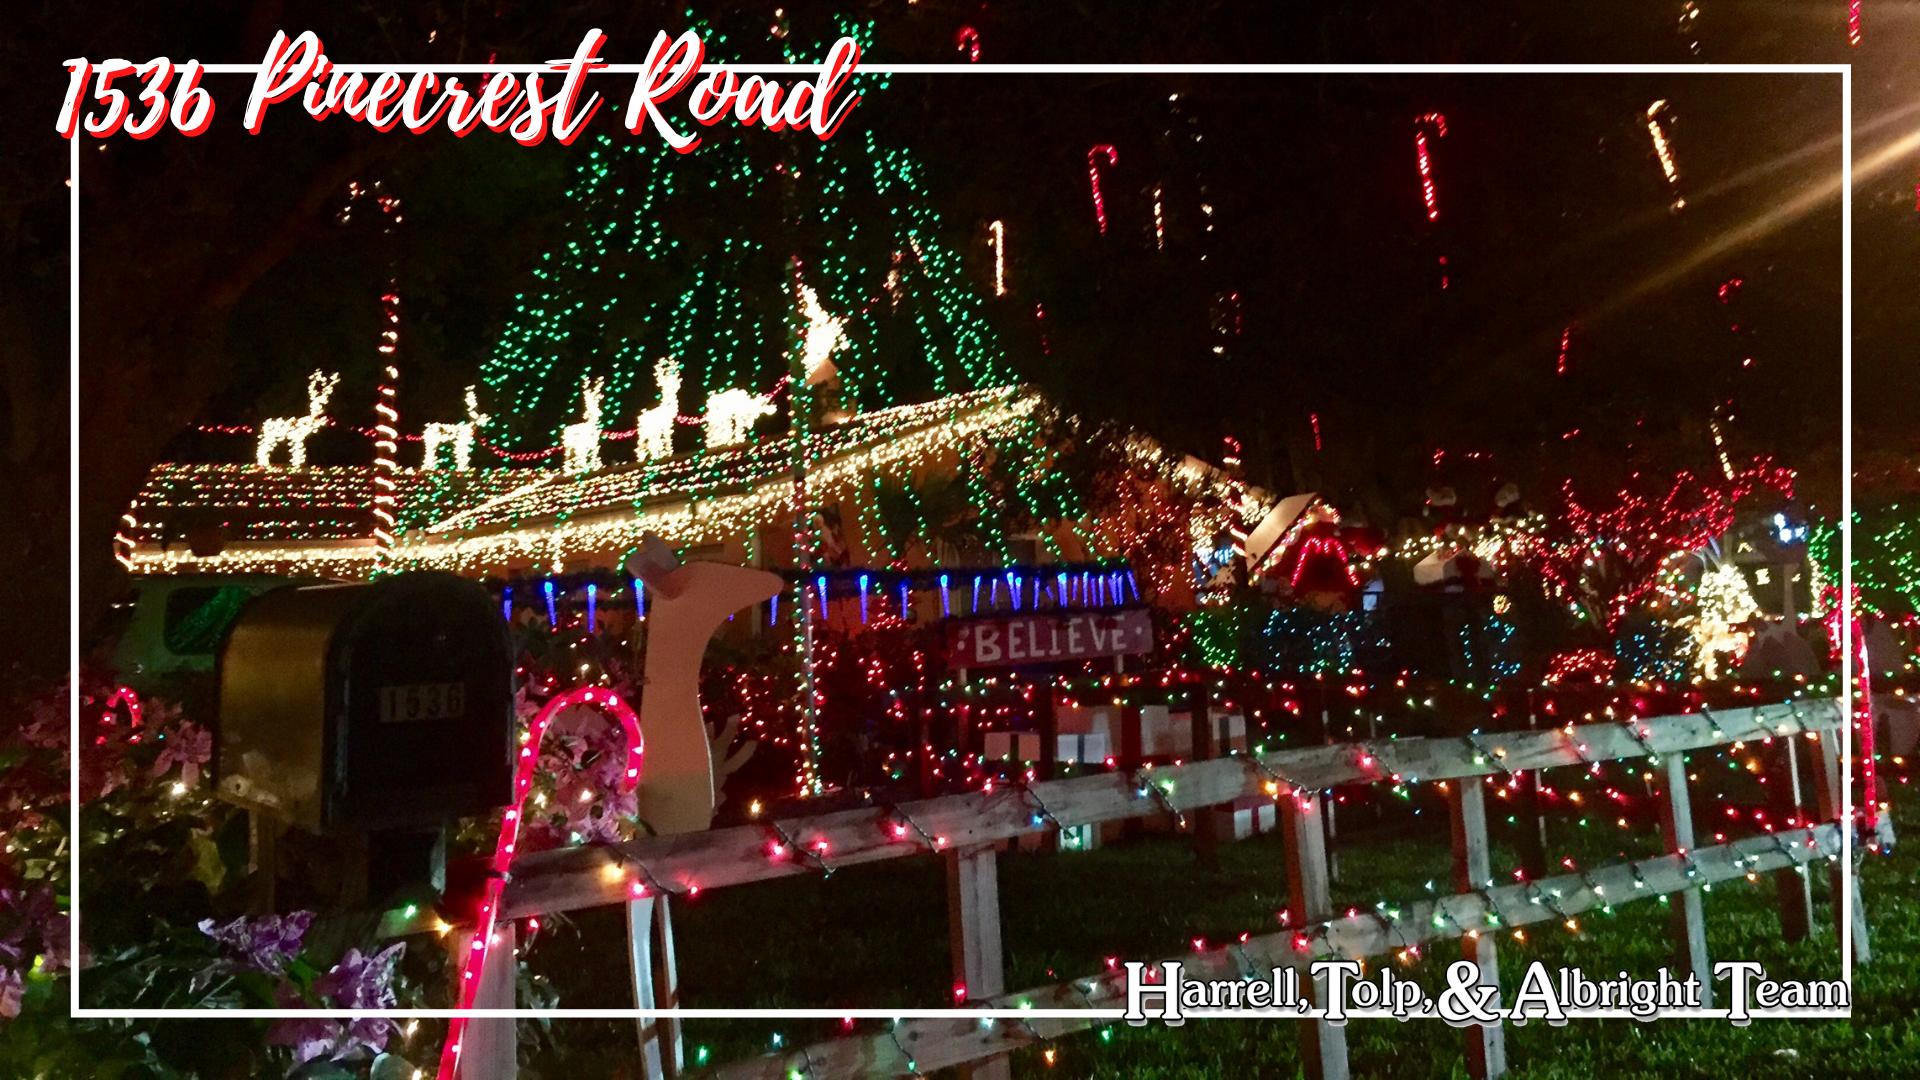 1536 Pinecrest Road